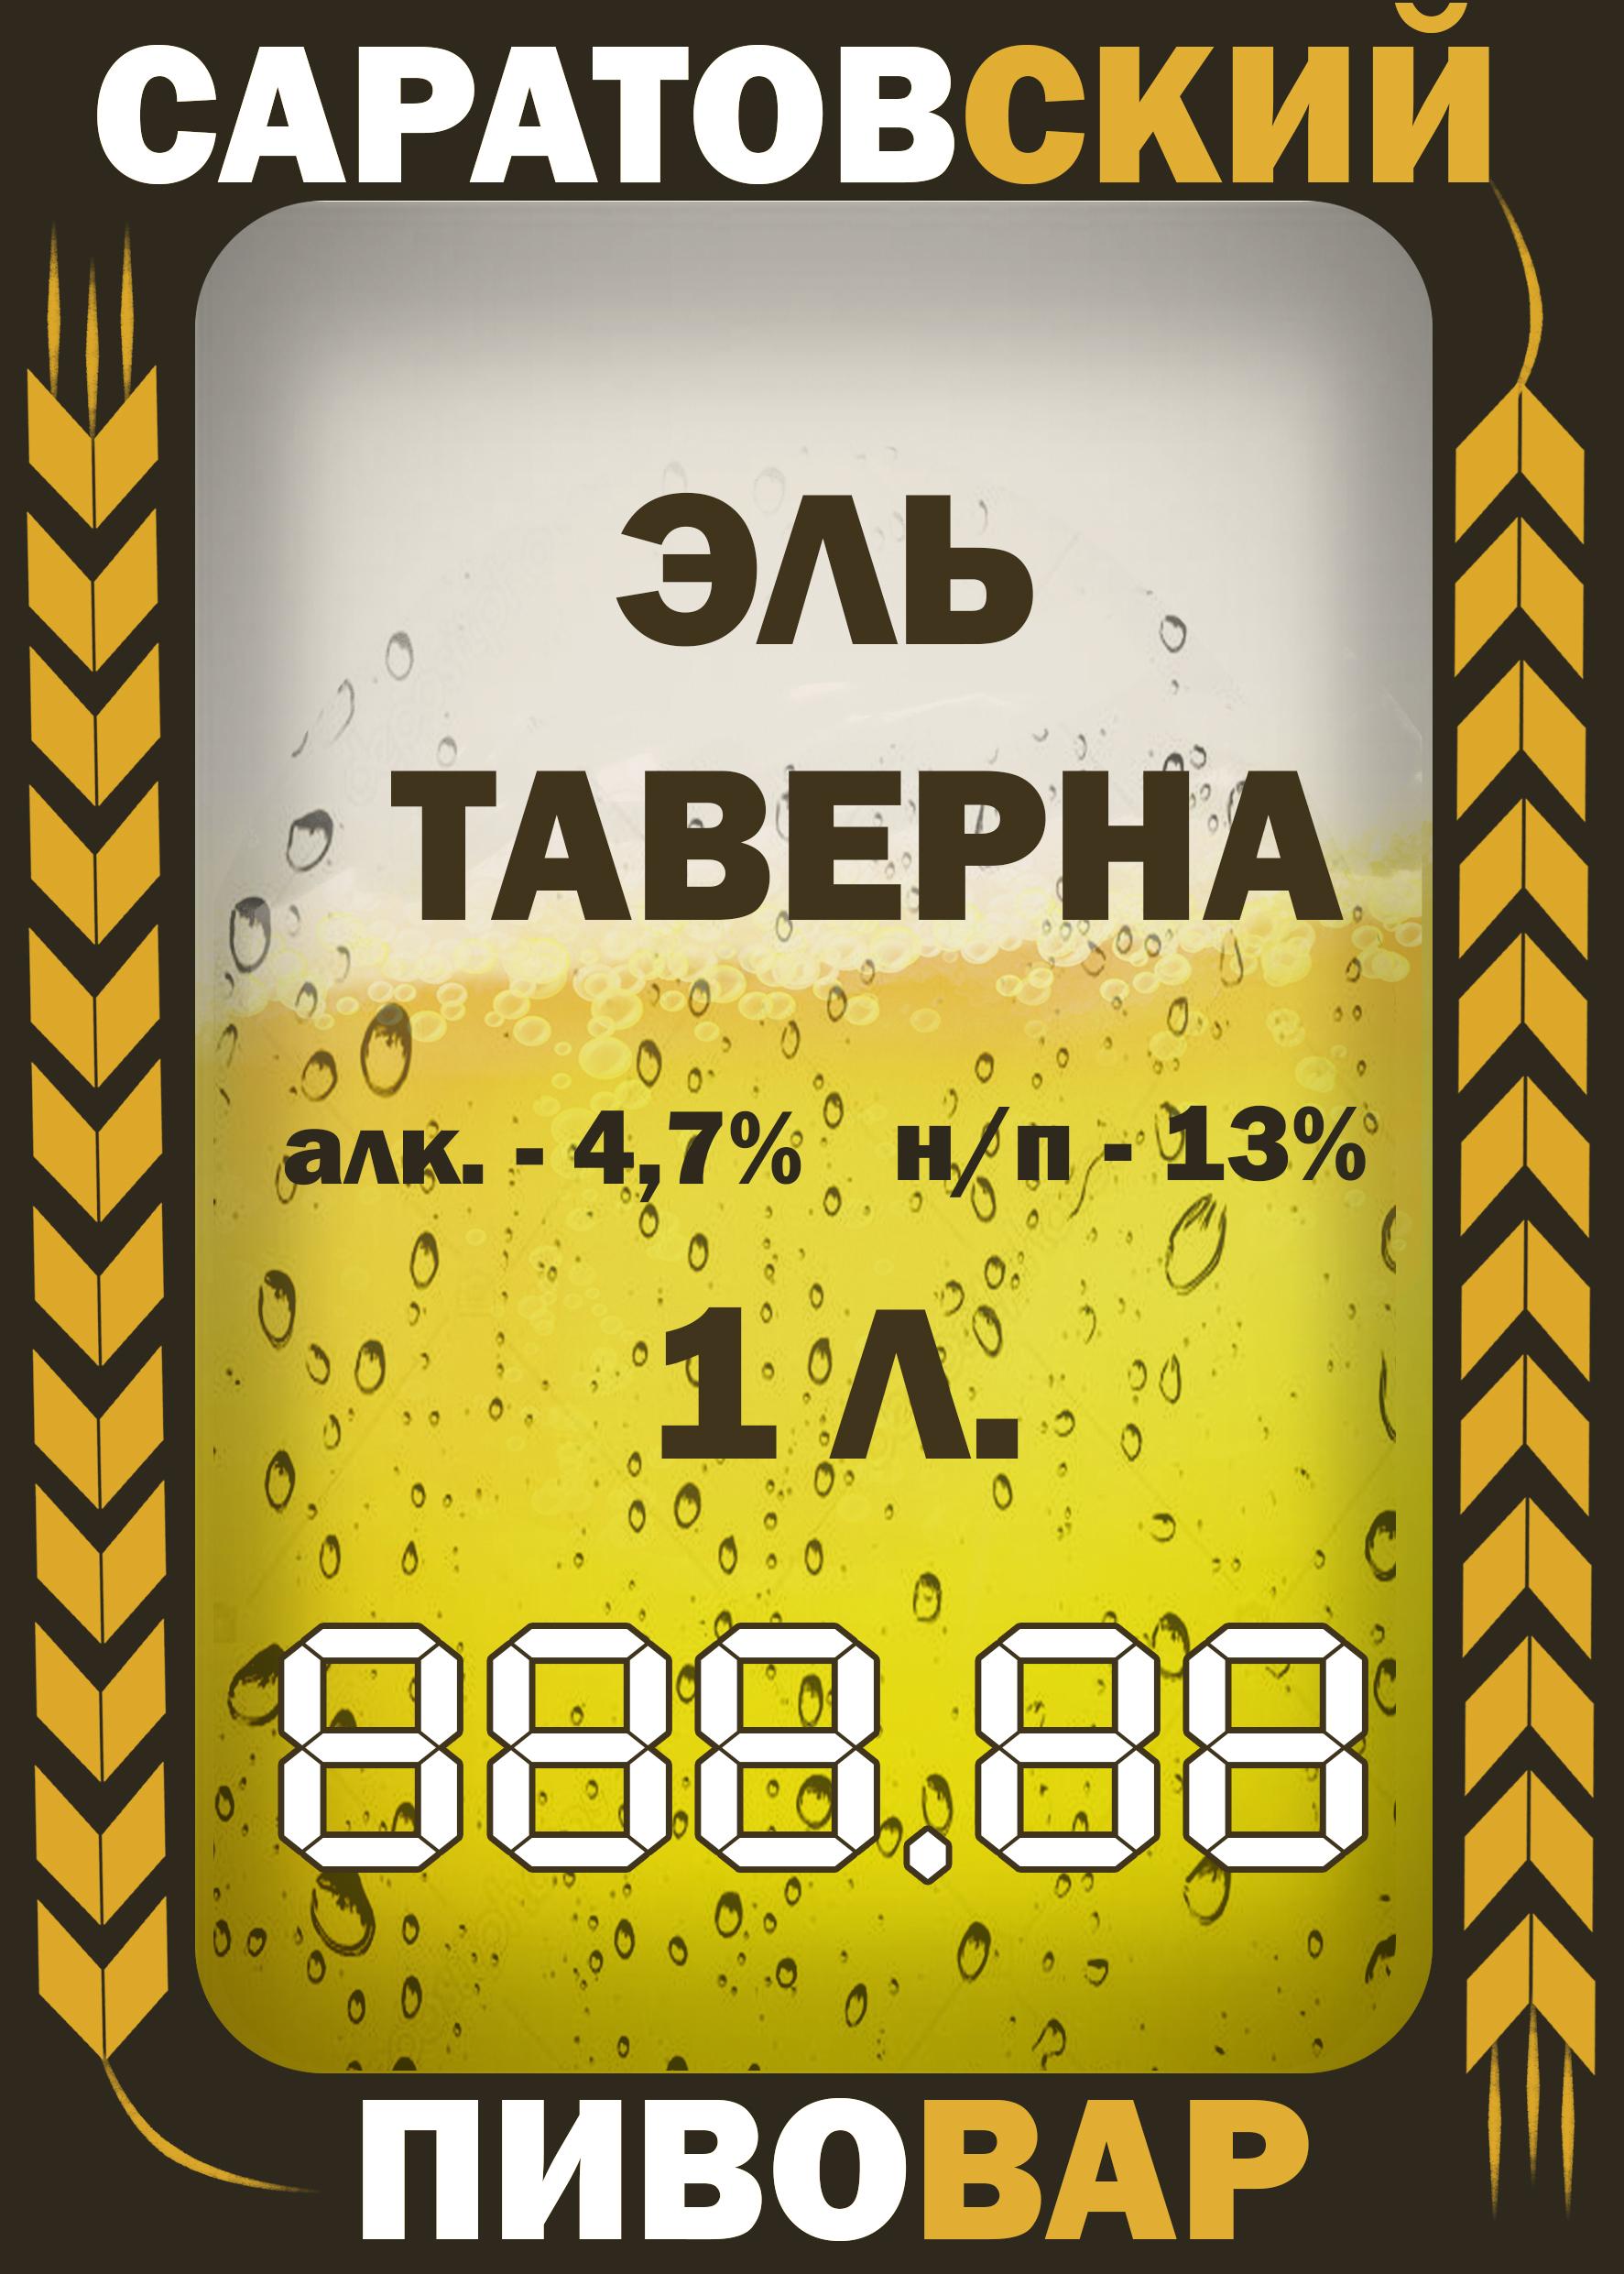 Разработка логотипа для частной пивоварни фото f_9075d7c96313b9b0.jpg